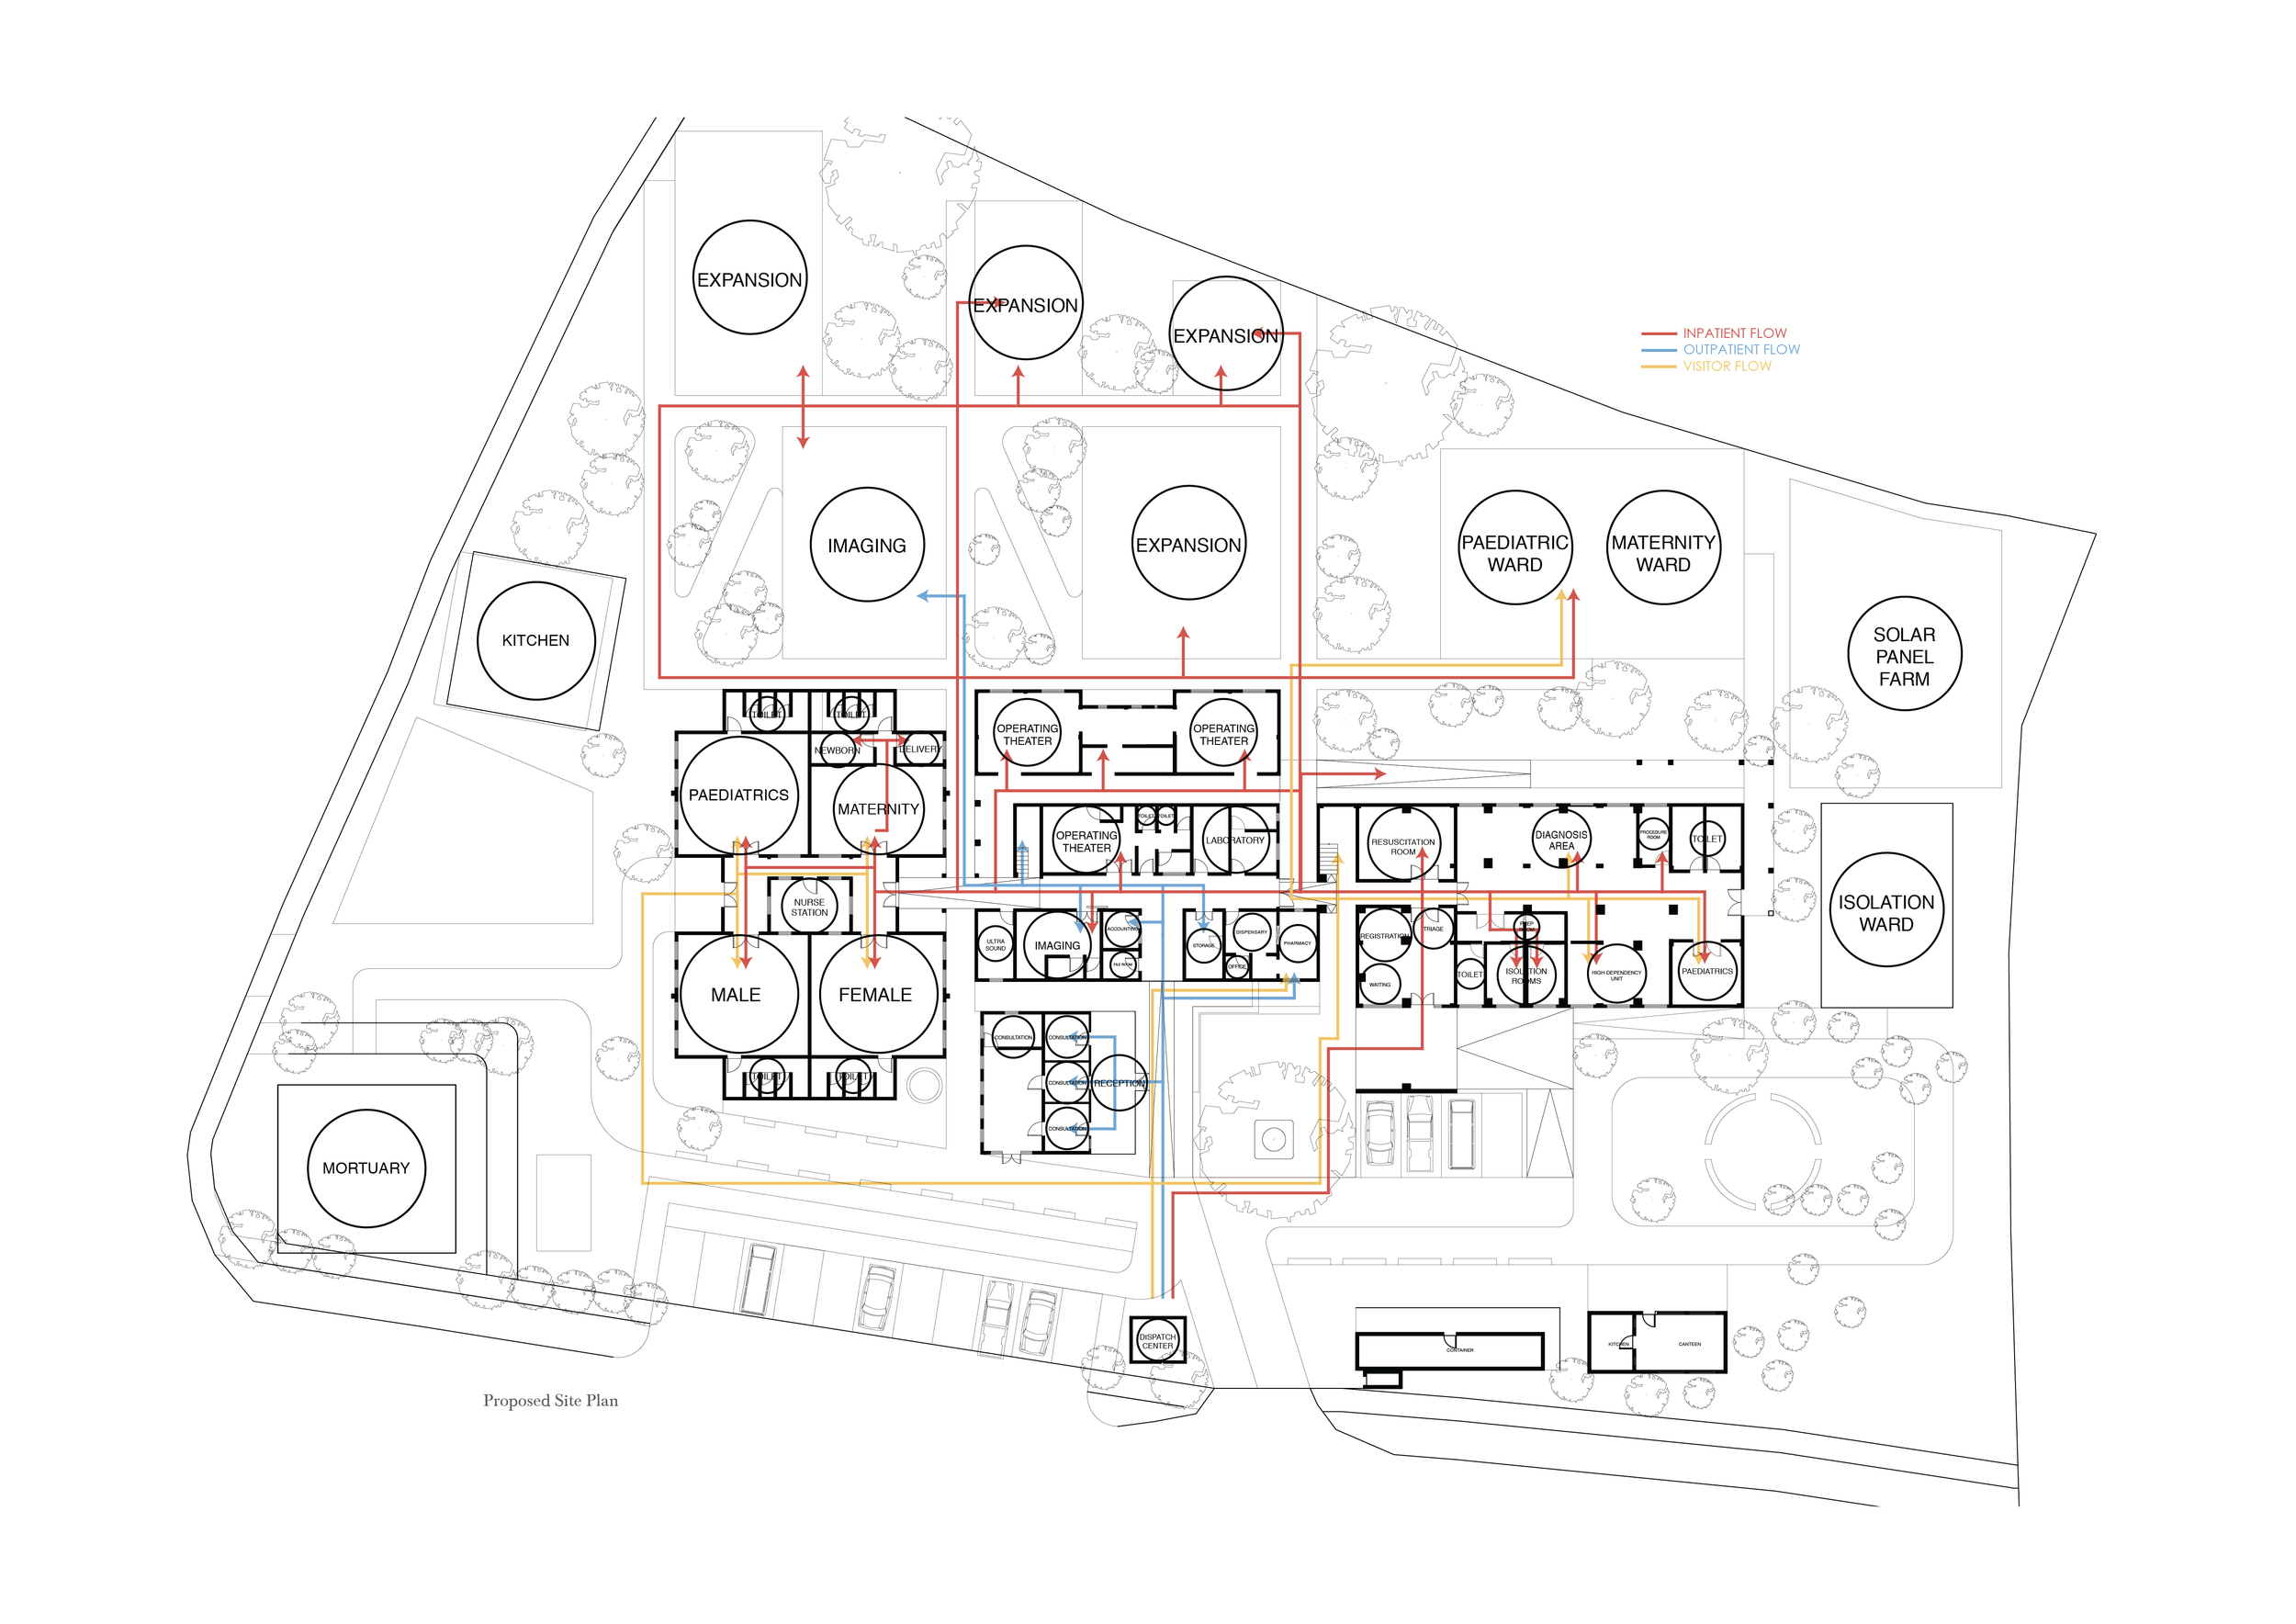 03_SagamHospital_Masterplan_Artboard 8.jpg